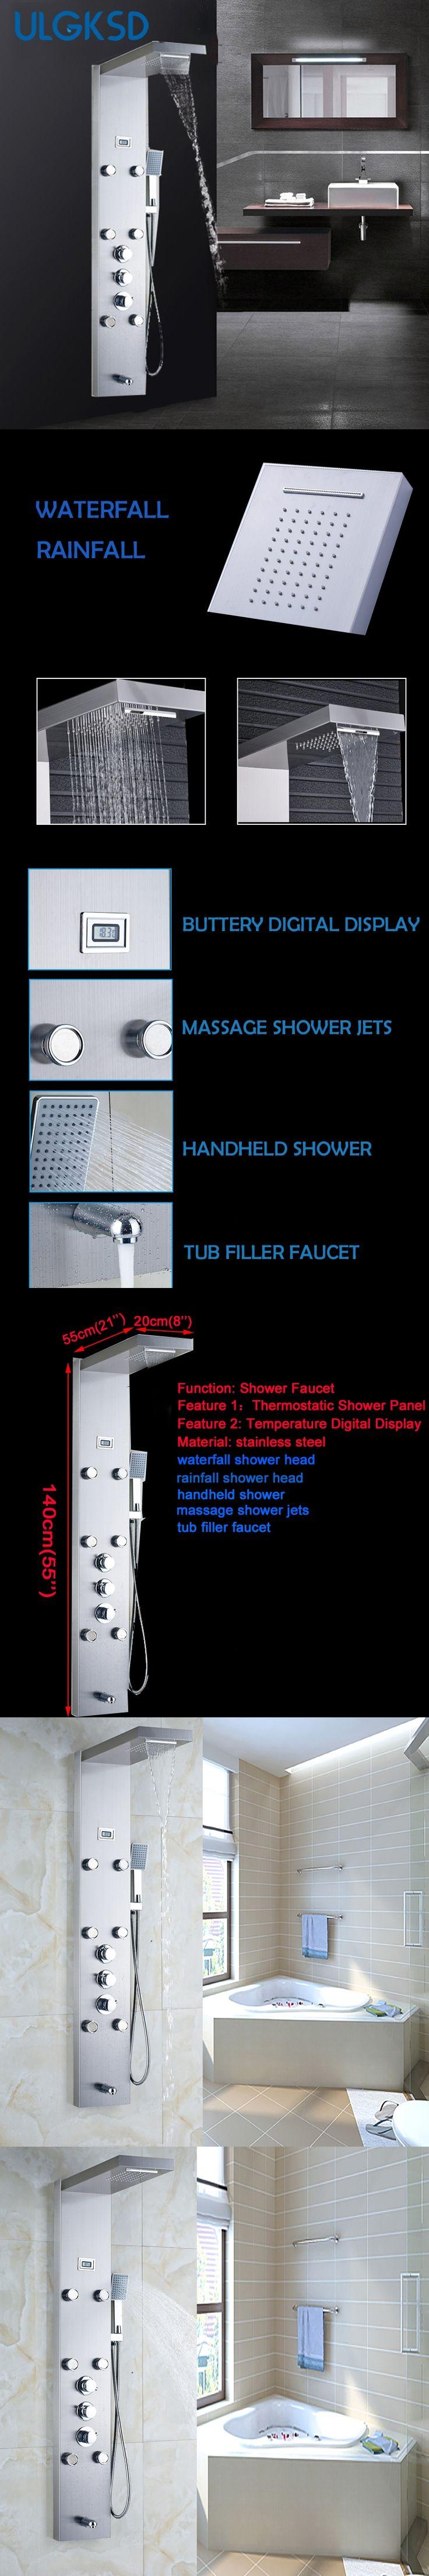 Ulgksd Bath Thermostatic Shower Panel Column Waterfall Rain Shower Faucet Massage Jets Tub Hand Shower System